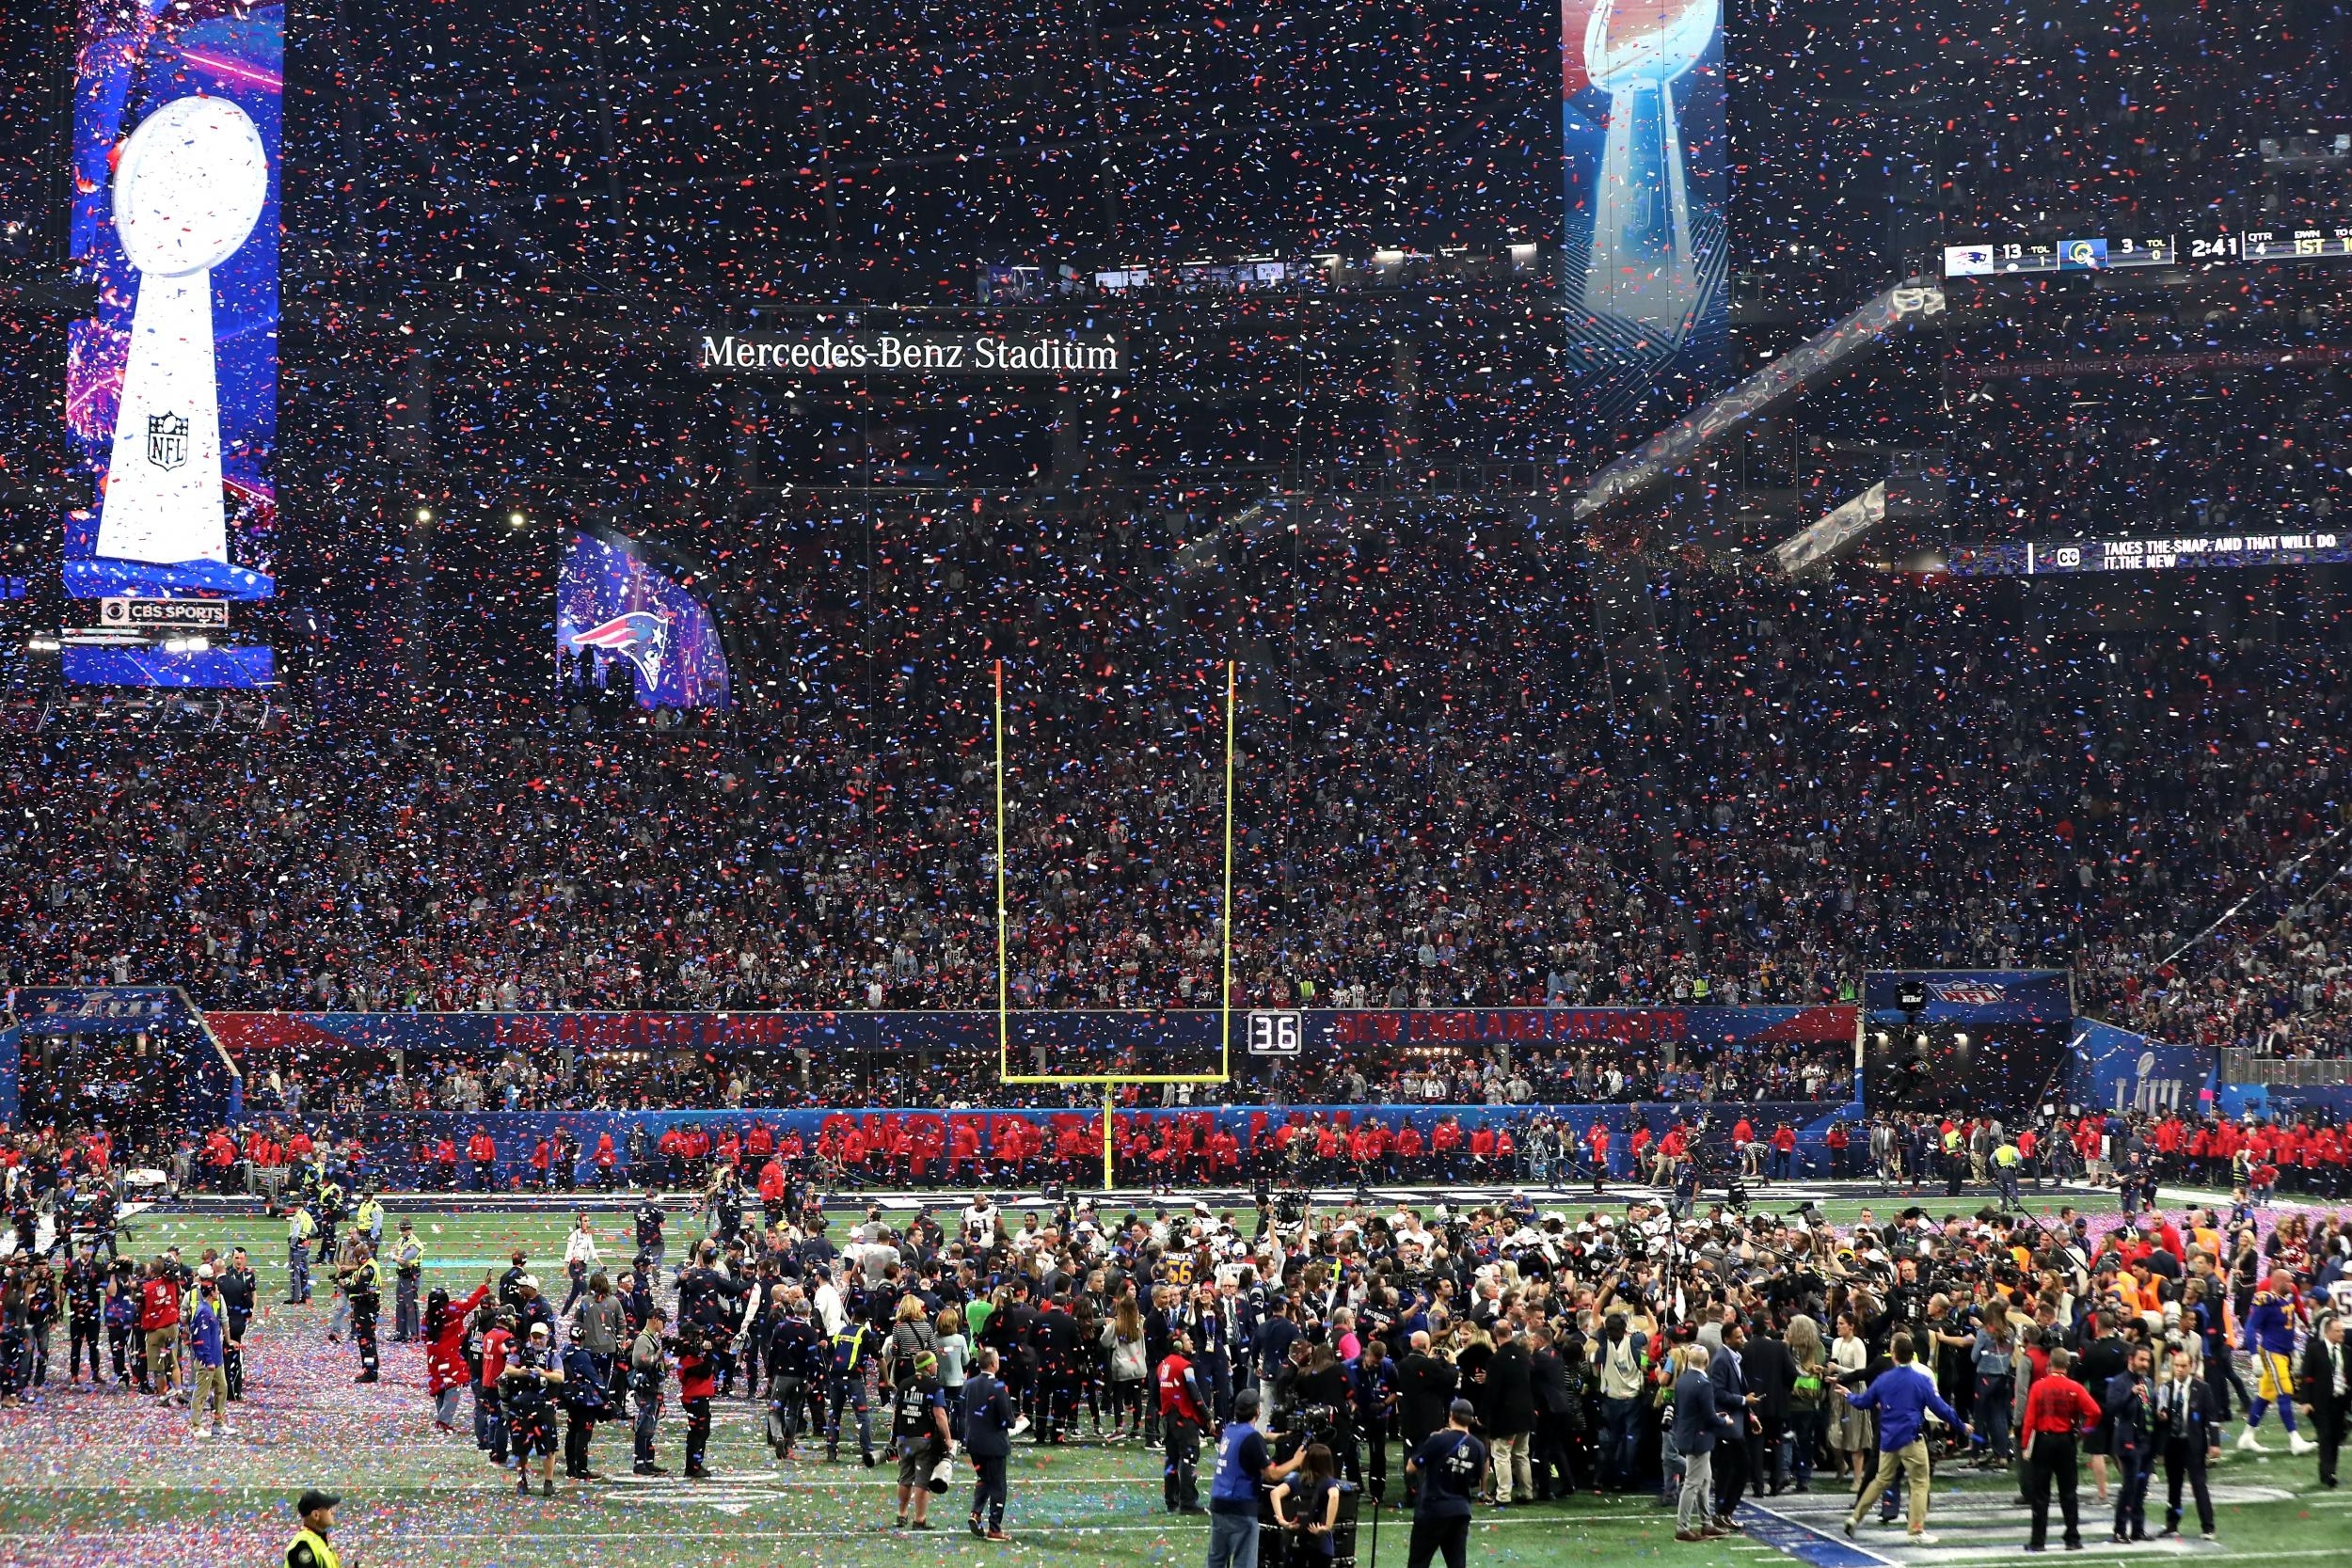 Super Bowl 2019 Attendance: La Rams Vs New England Patriots with regard to Super Bowl Attendance 2019